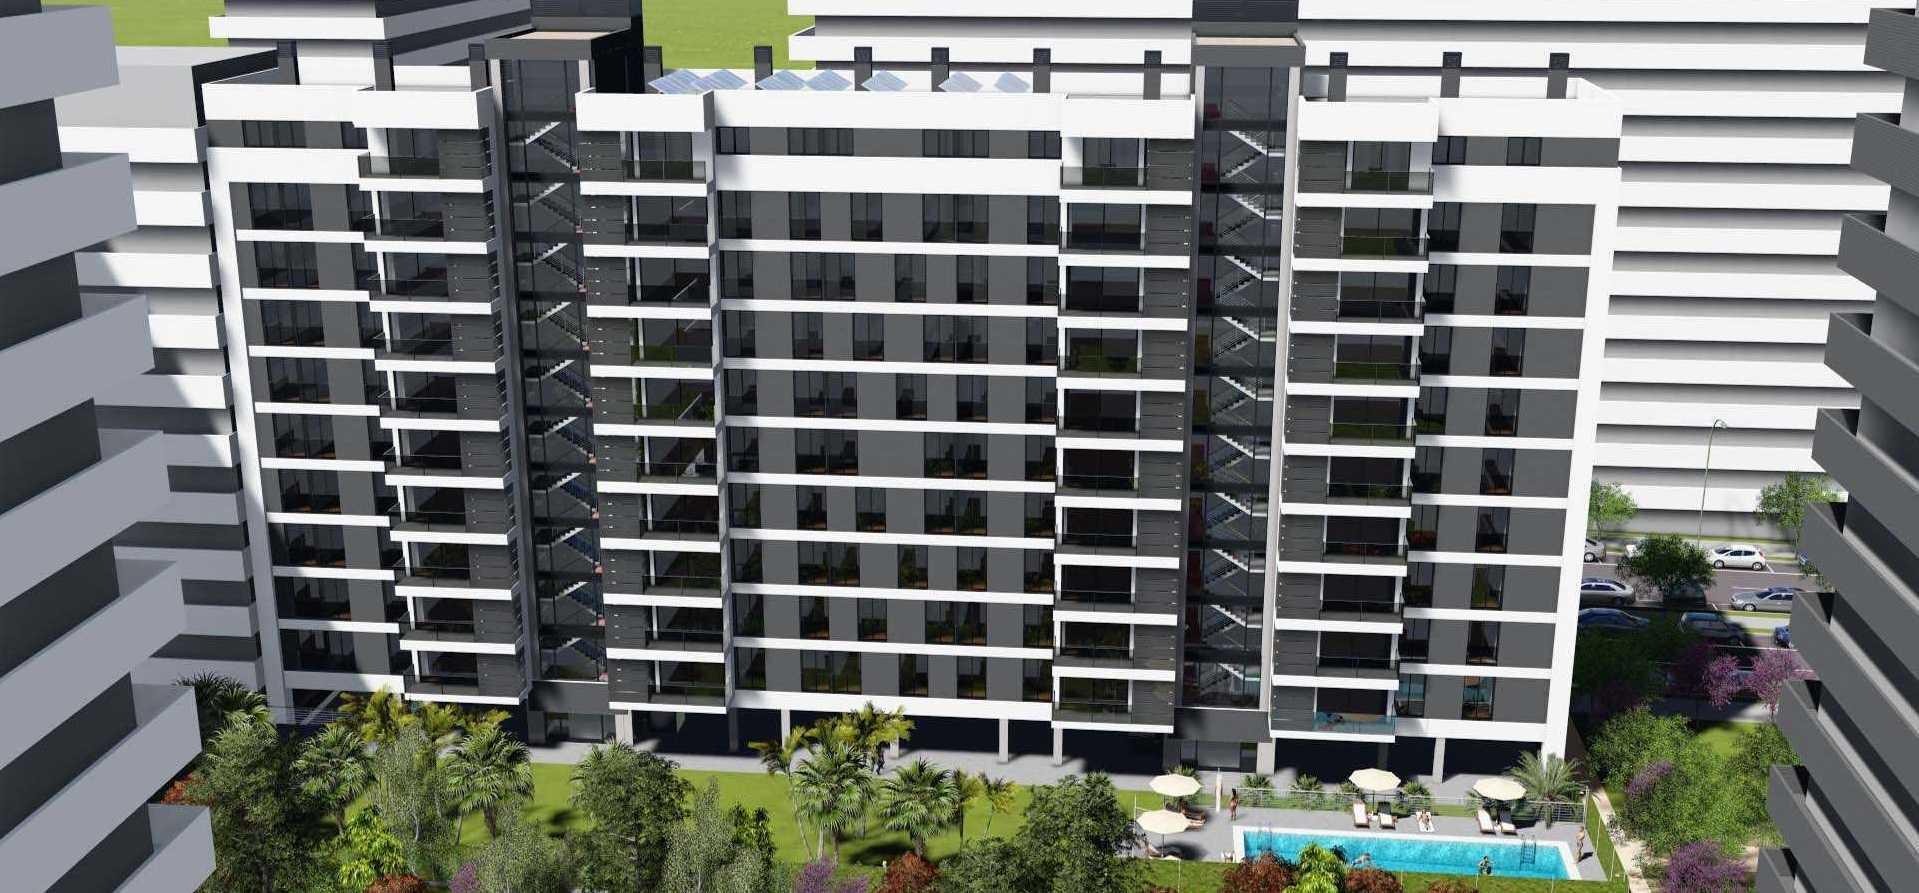 Proyecto arquitectonico urbanización